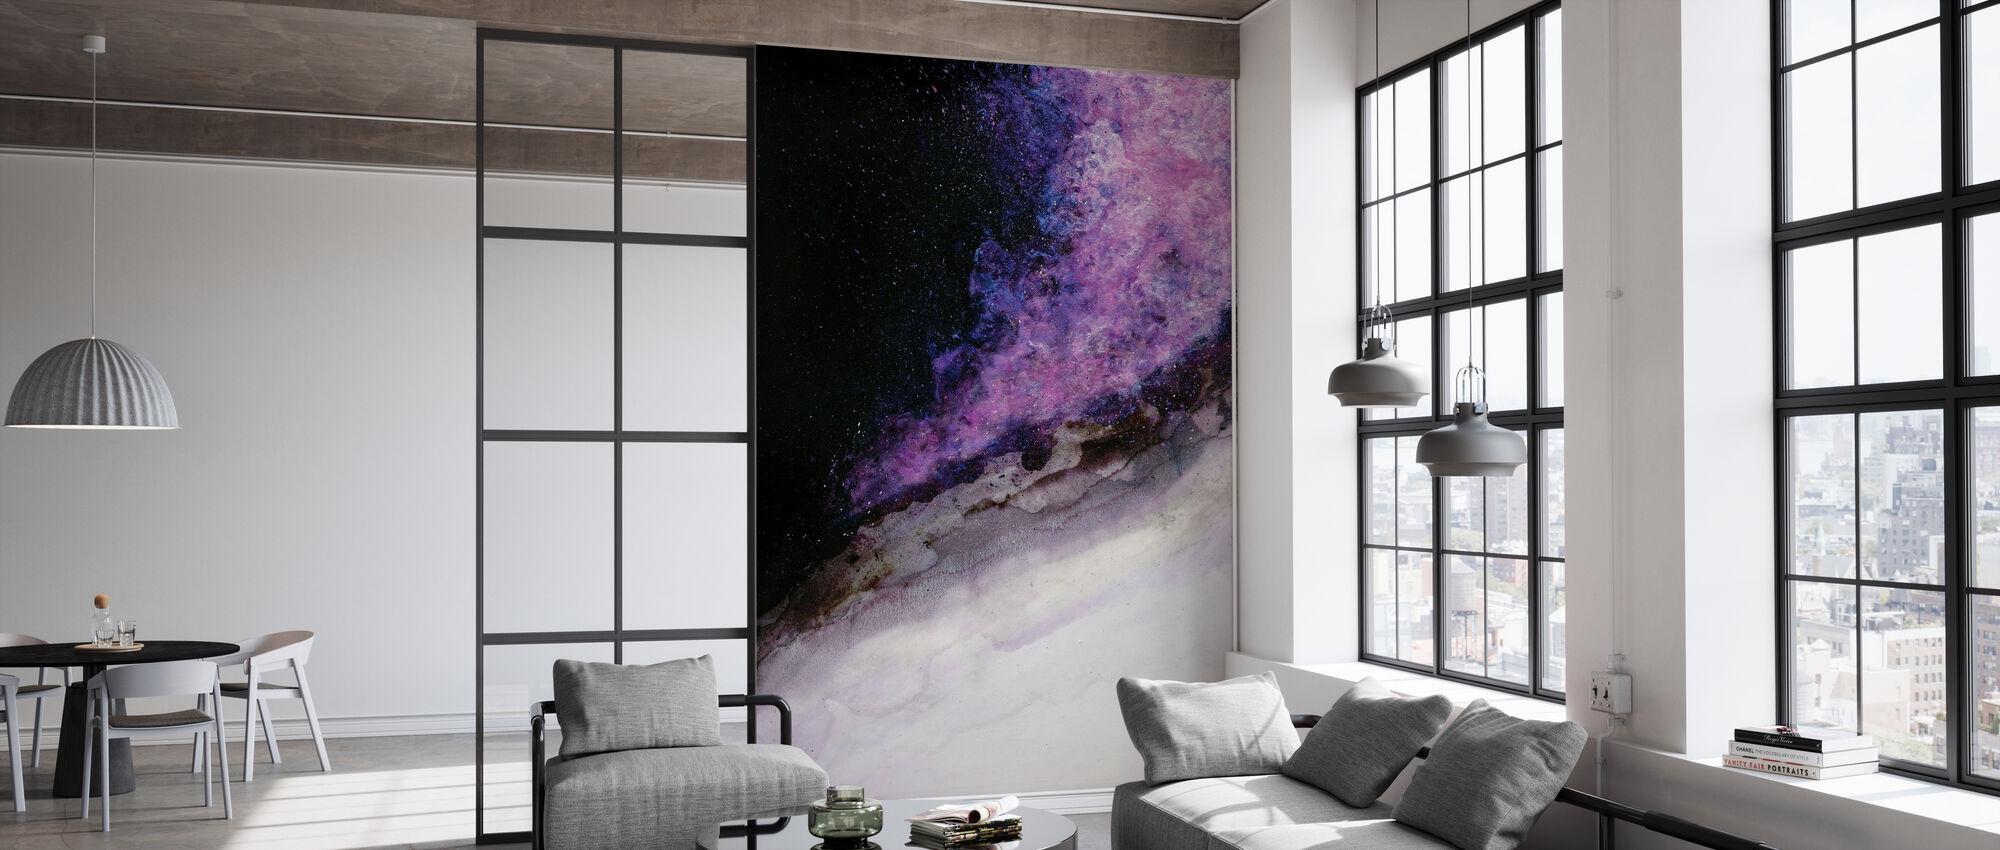 Arcana - Wallpaper - Office